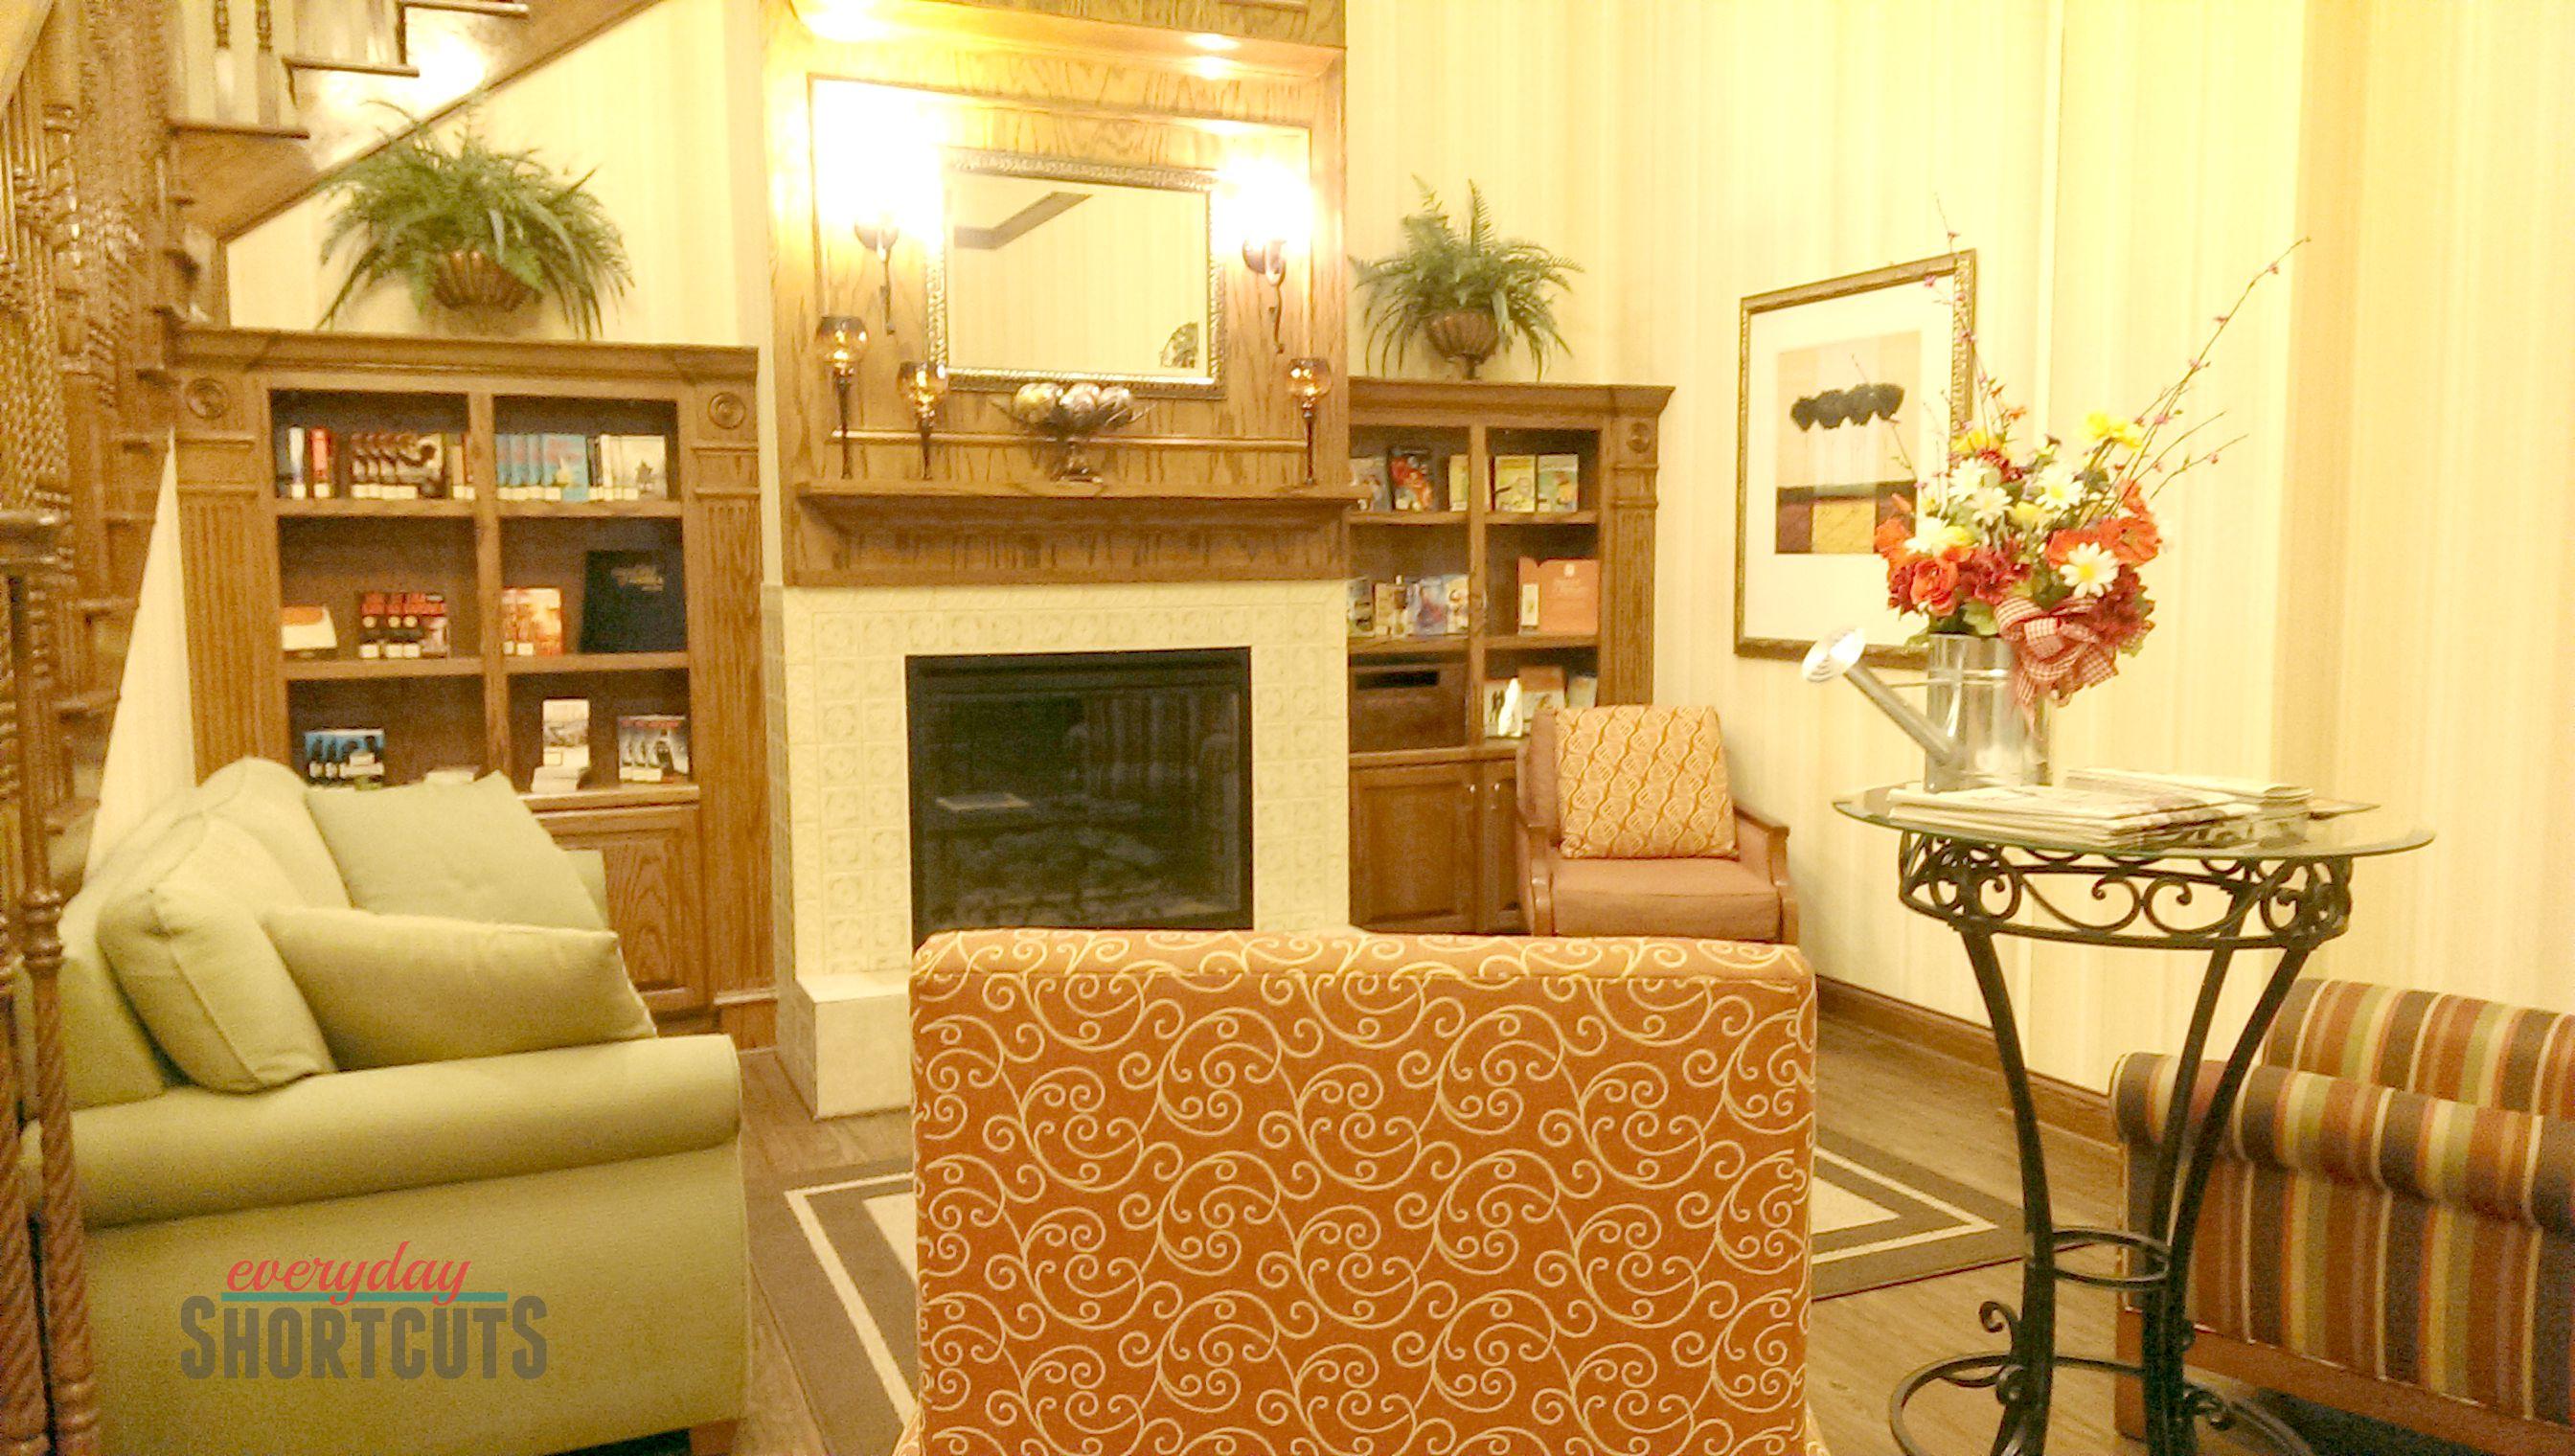 country inn & suites lobby